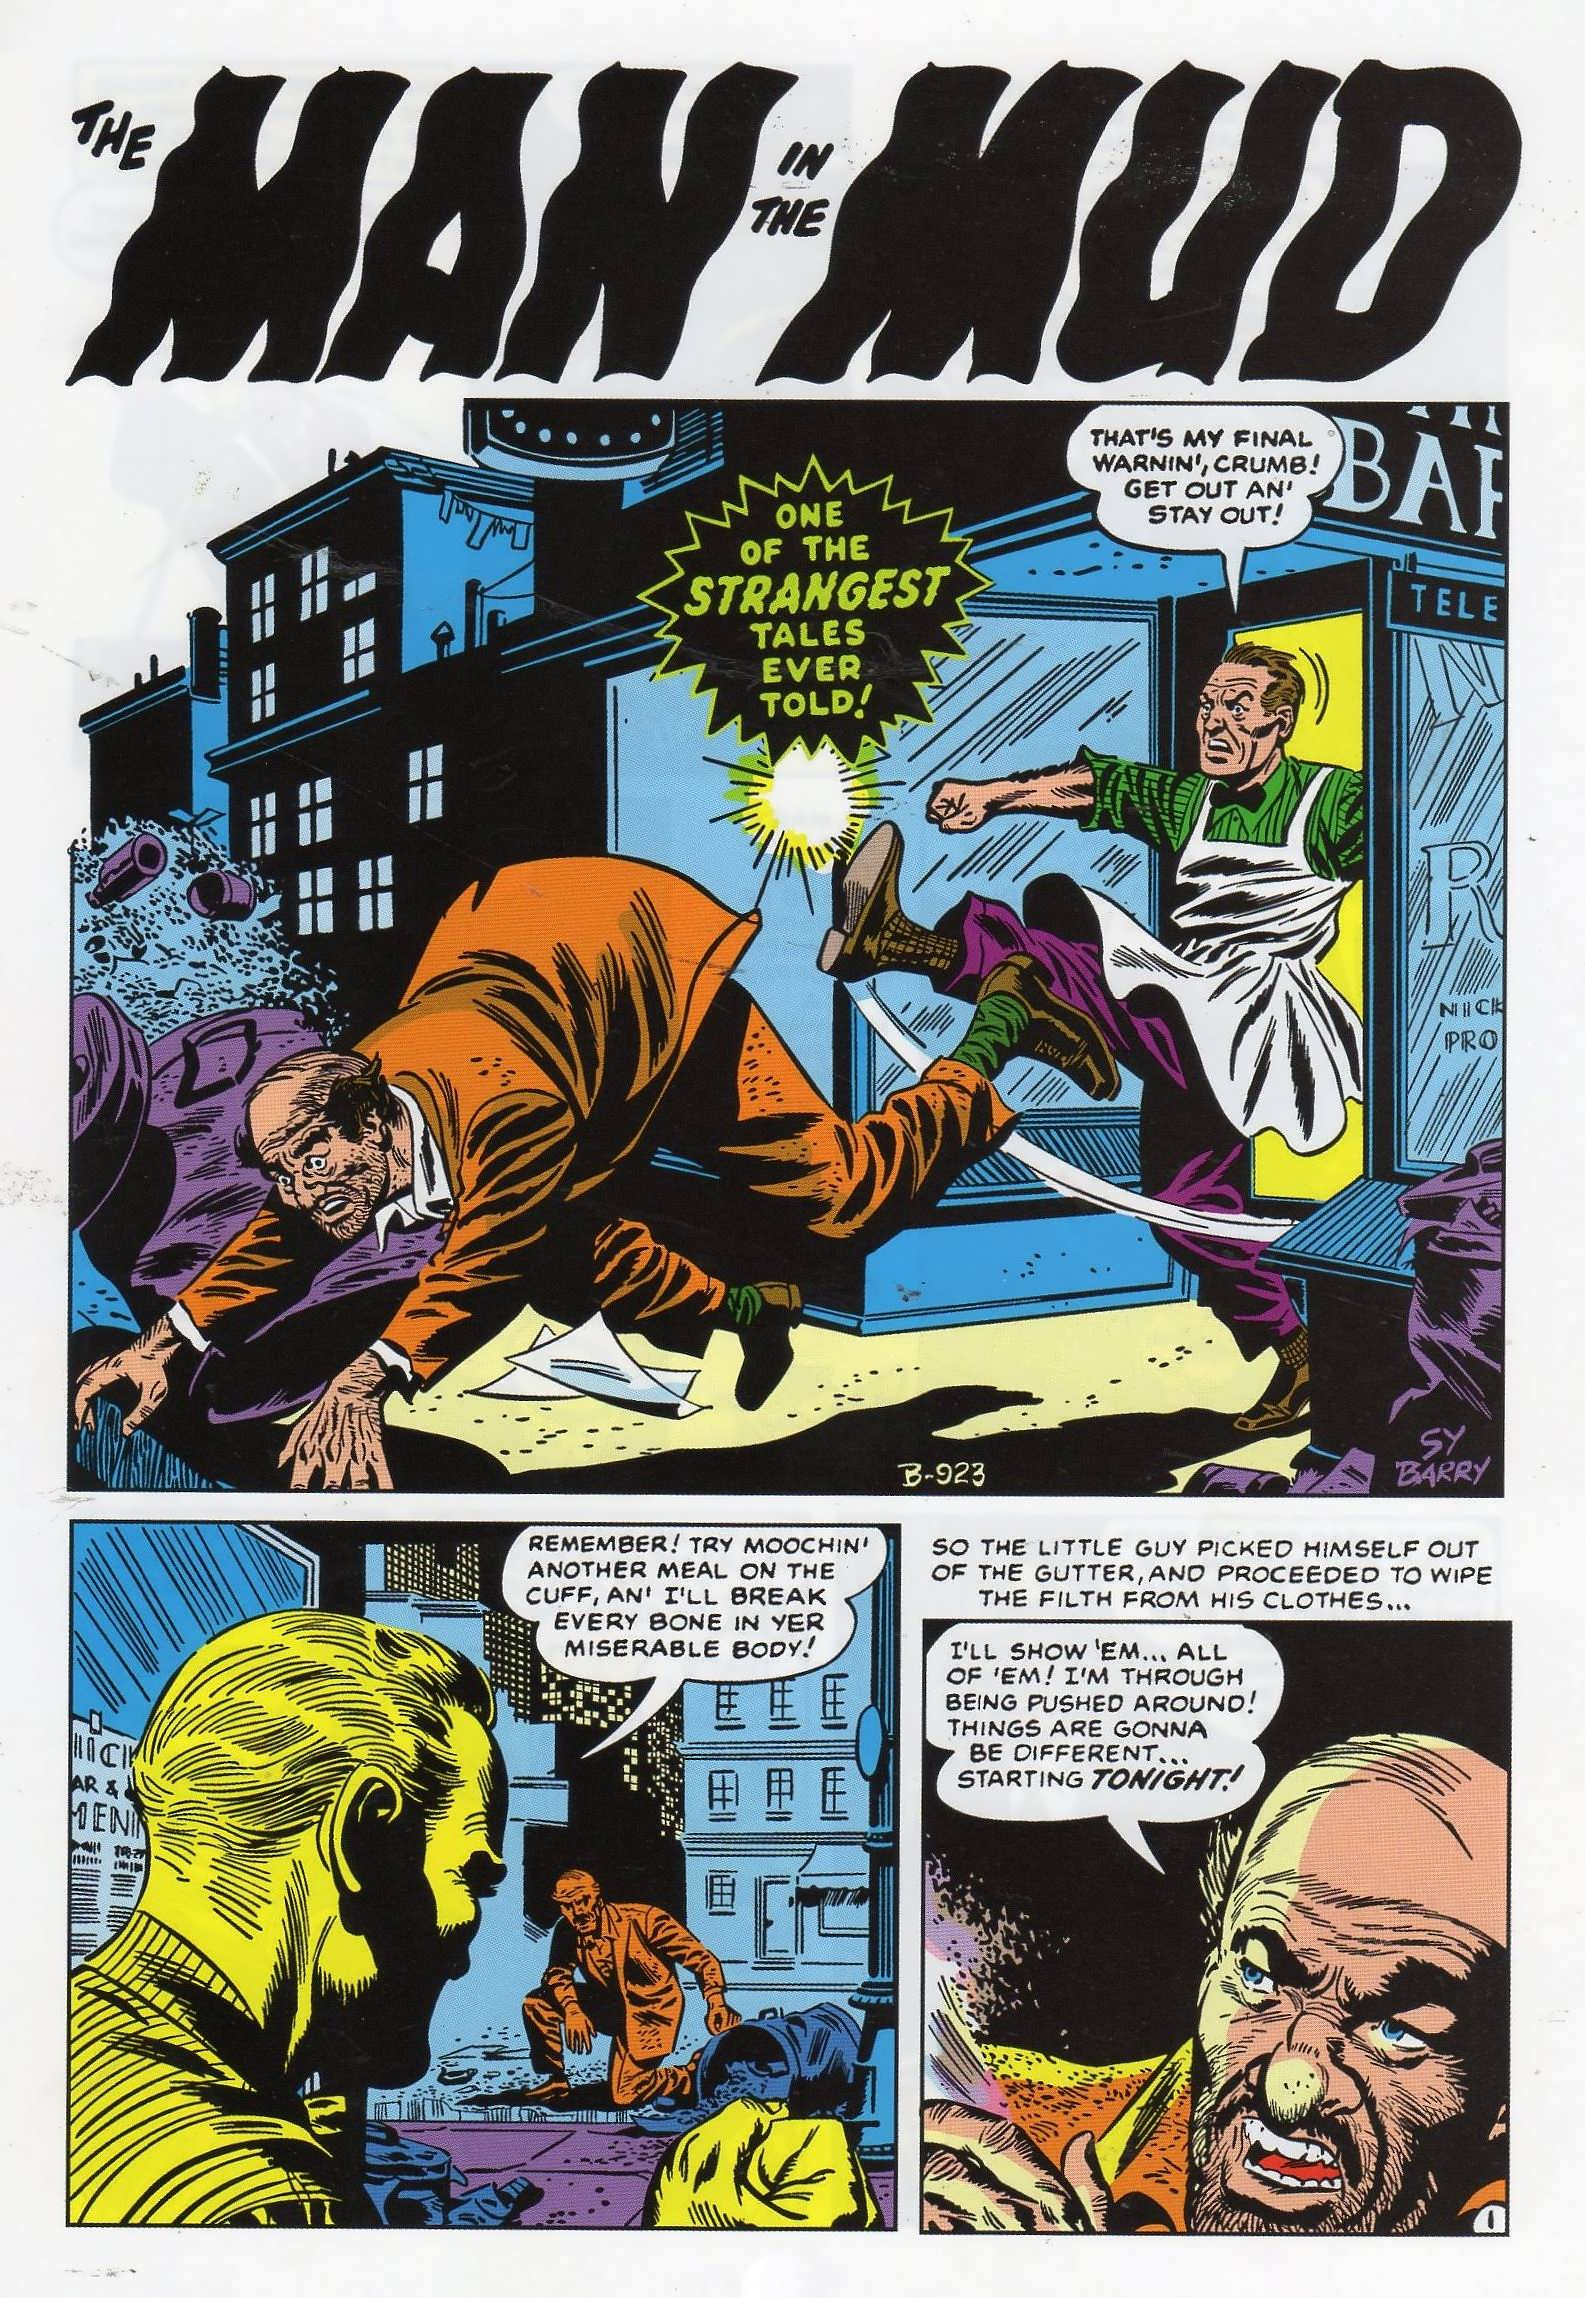 Strange Tales (1951) #16 pg9, art by Sy Barry.